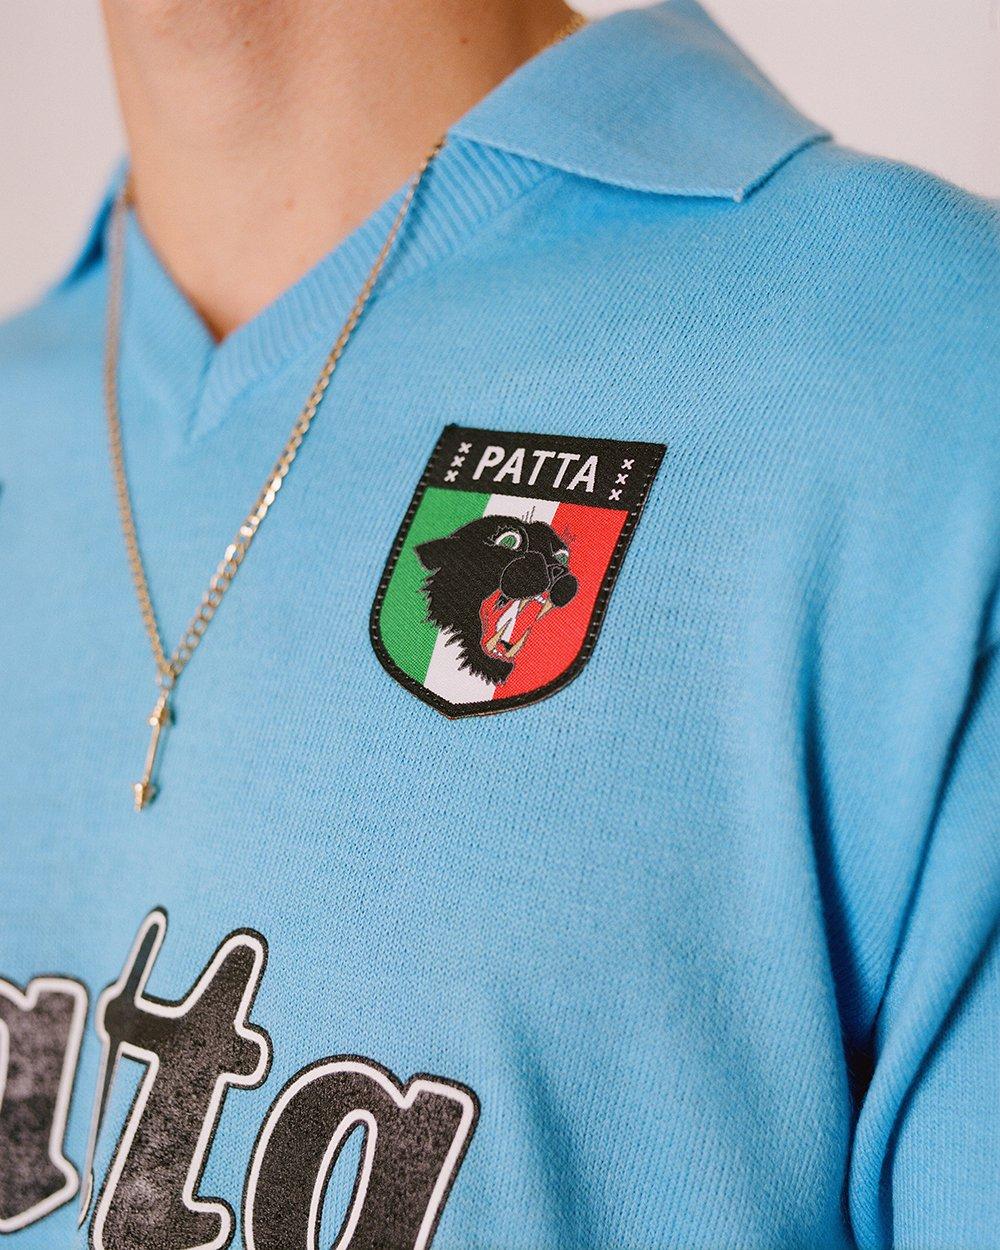 napoli, shirt, maradona, patta, ennerre, nr, retro voetbalshirt